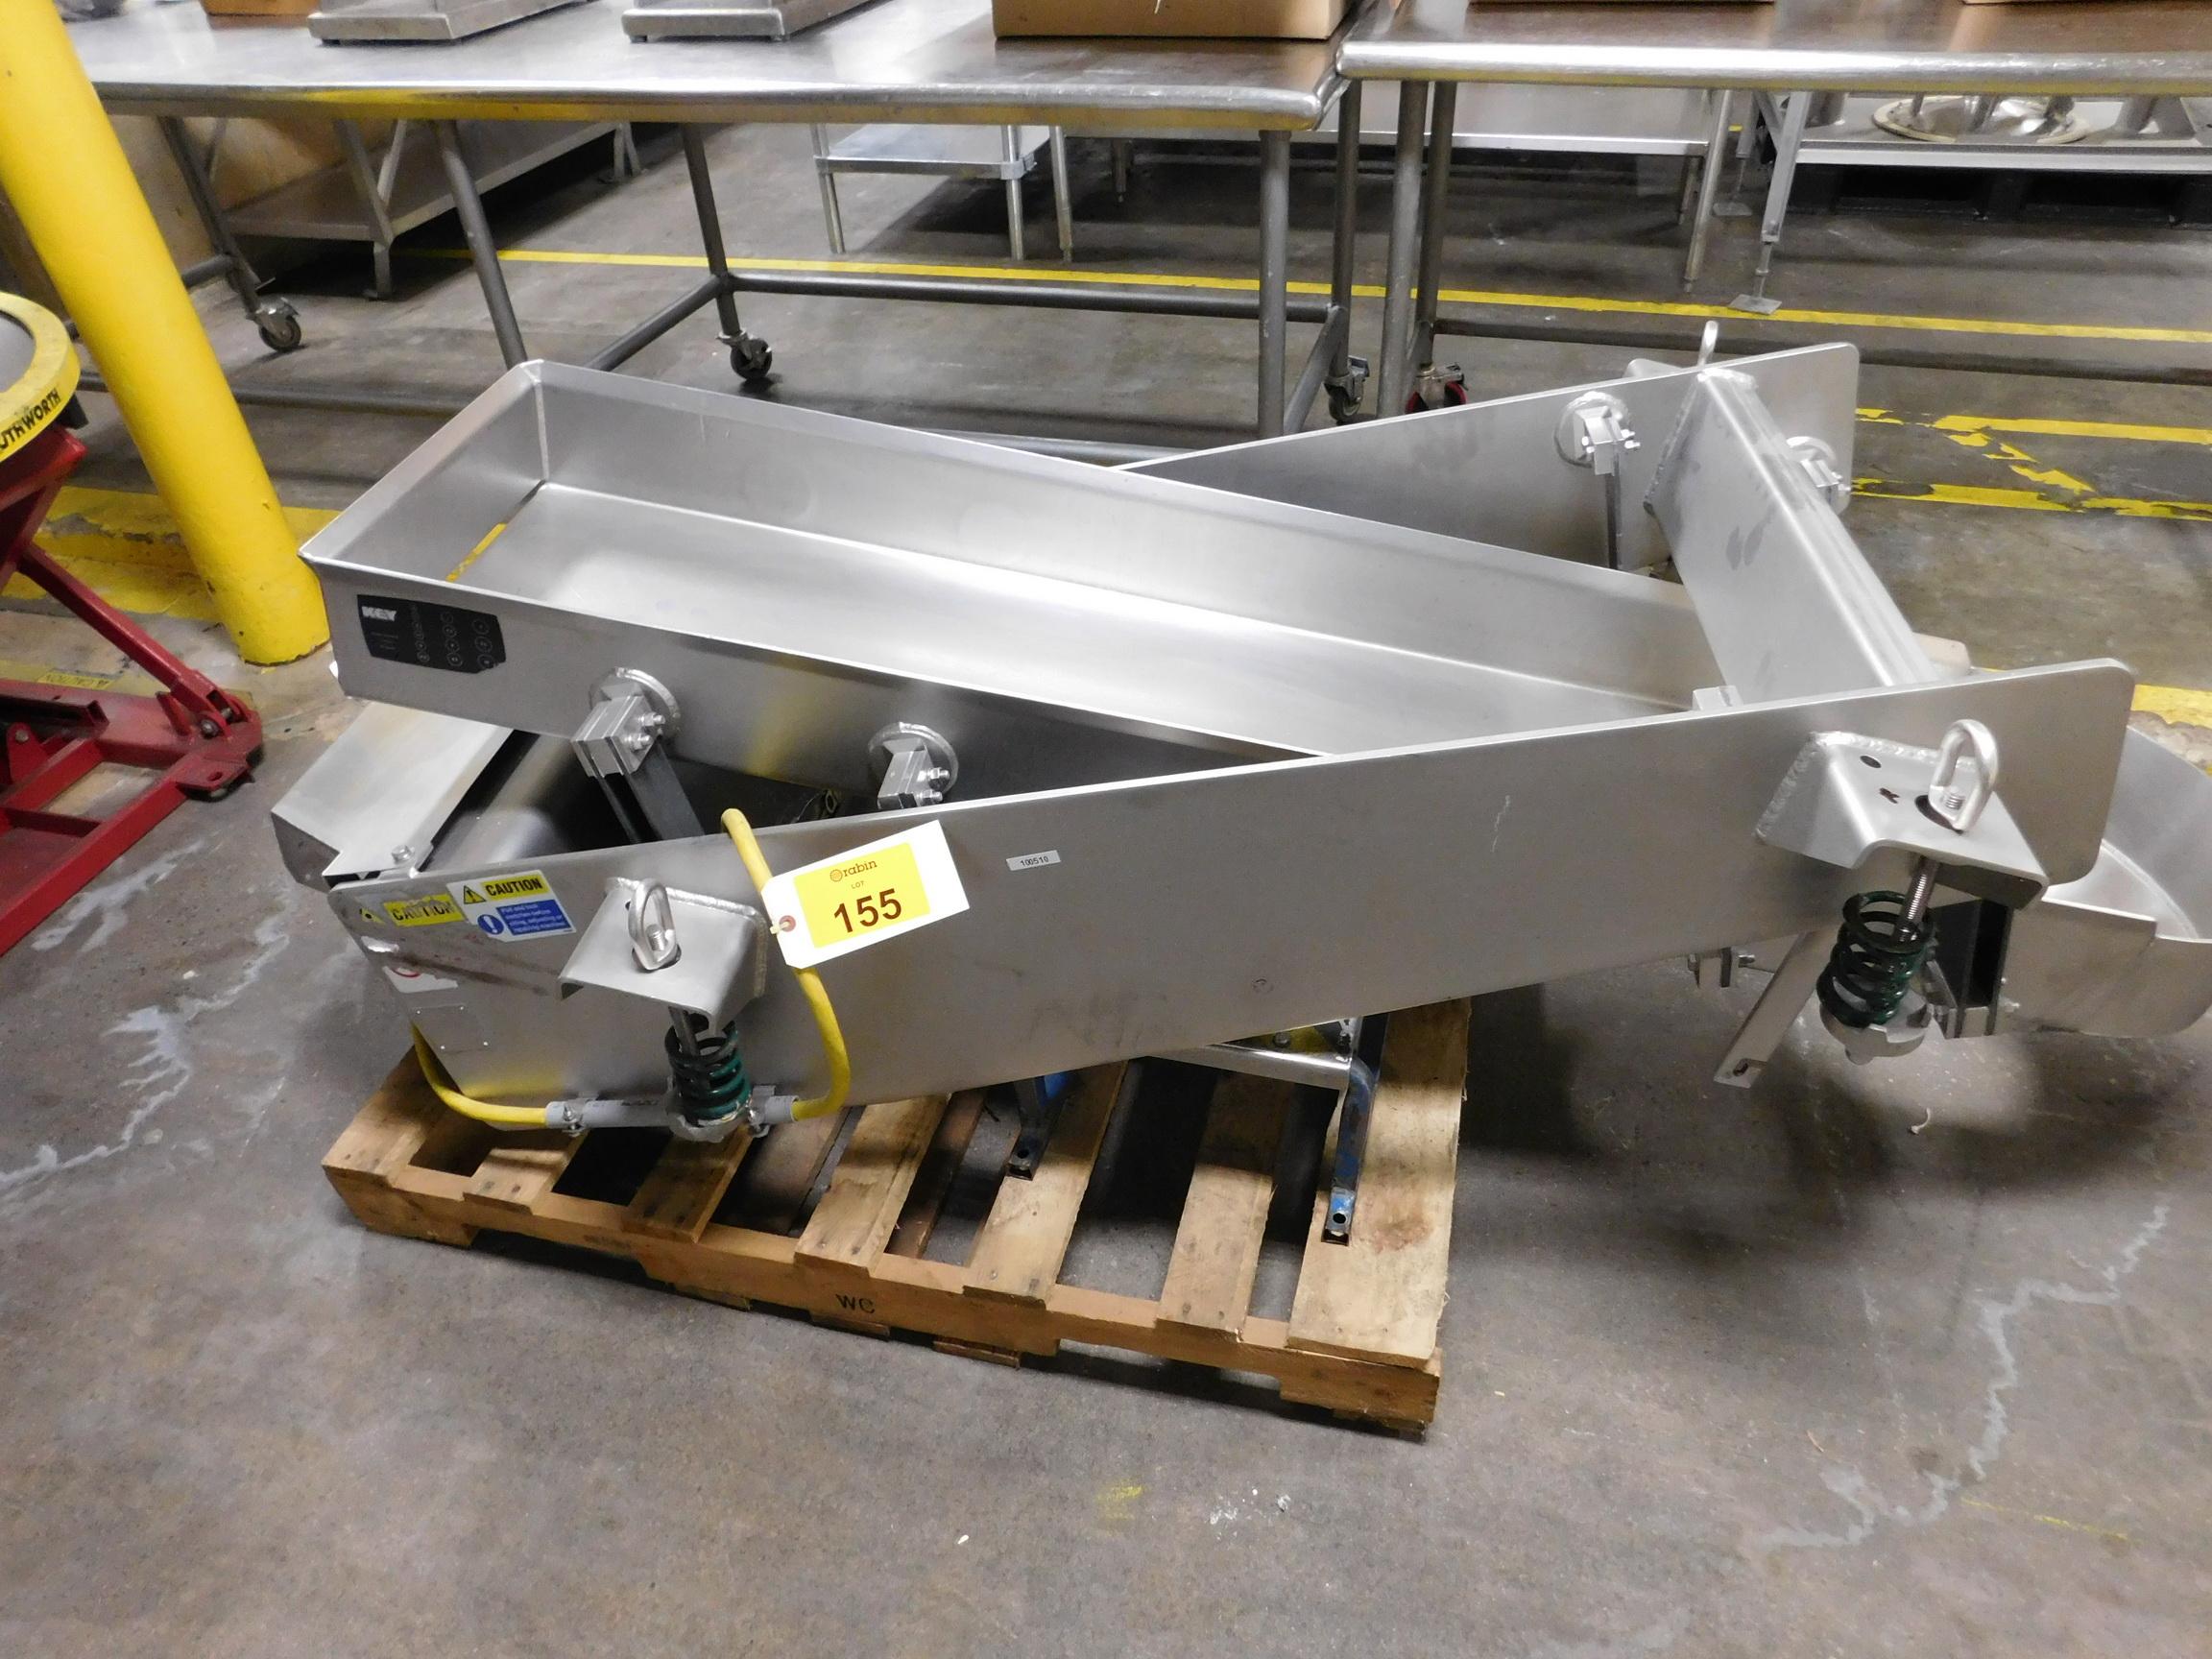 Lot 155 - Vibrator Feeder